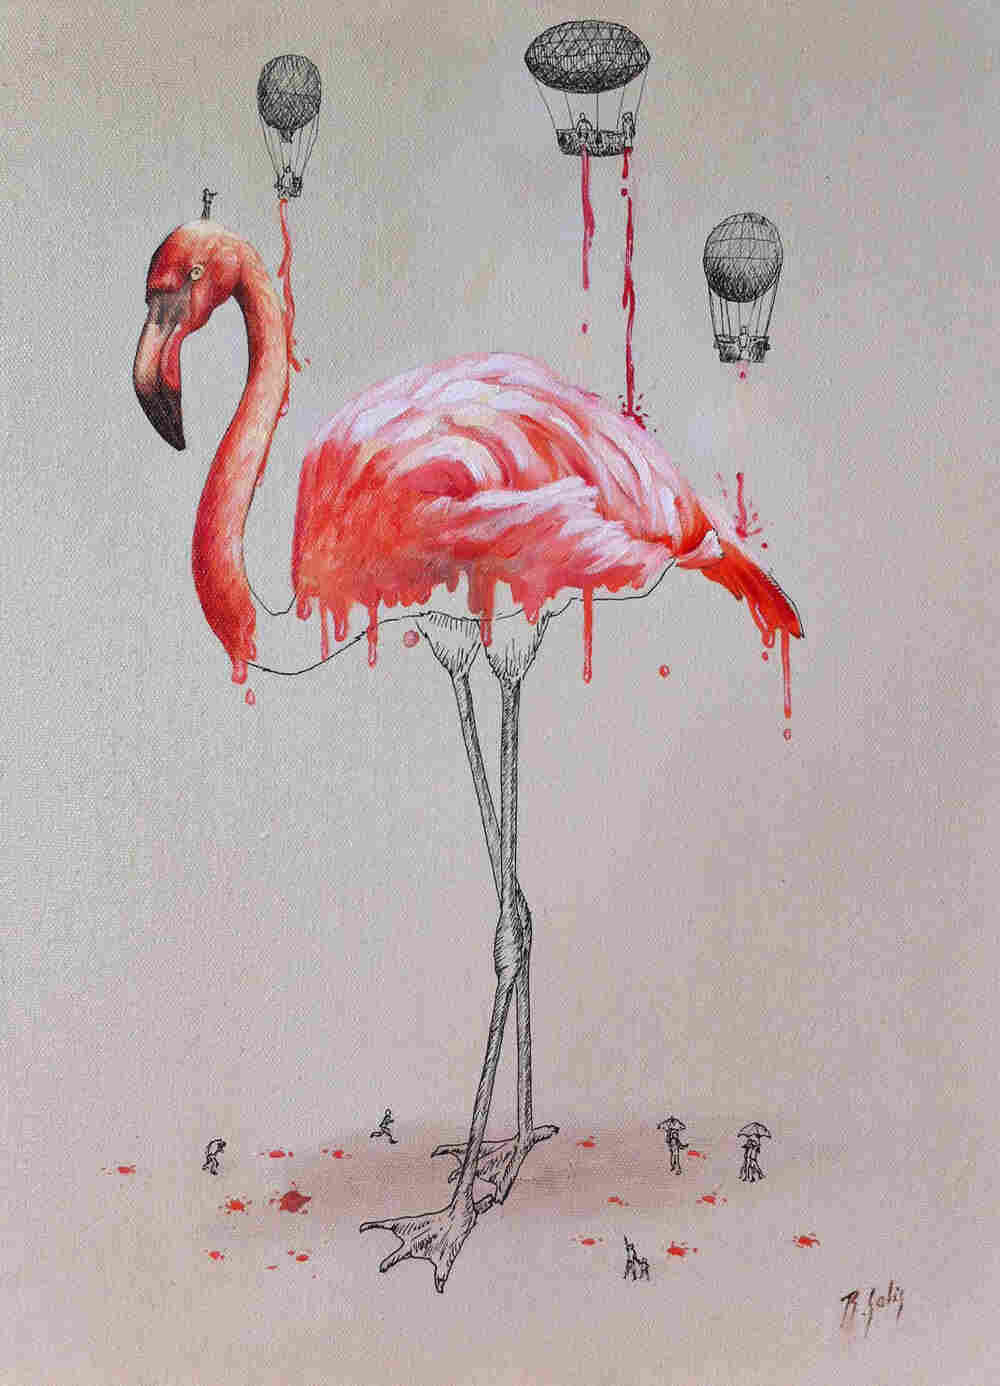 Teeny buckets of paint make a flamingo pink.